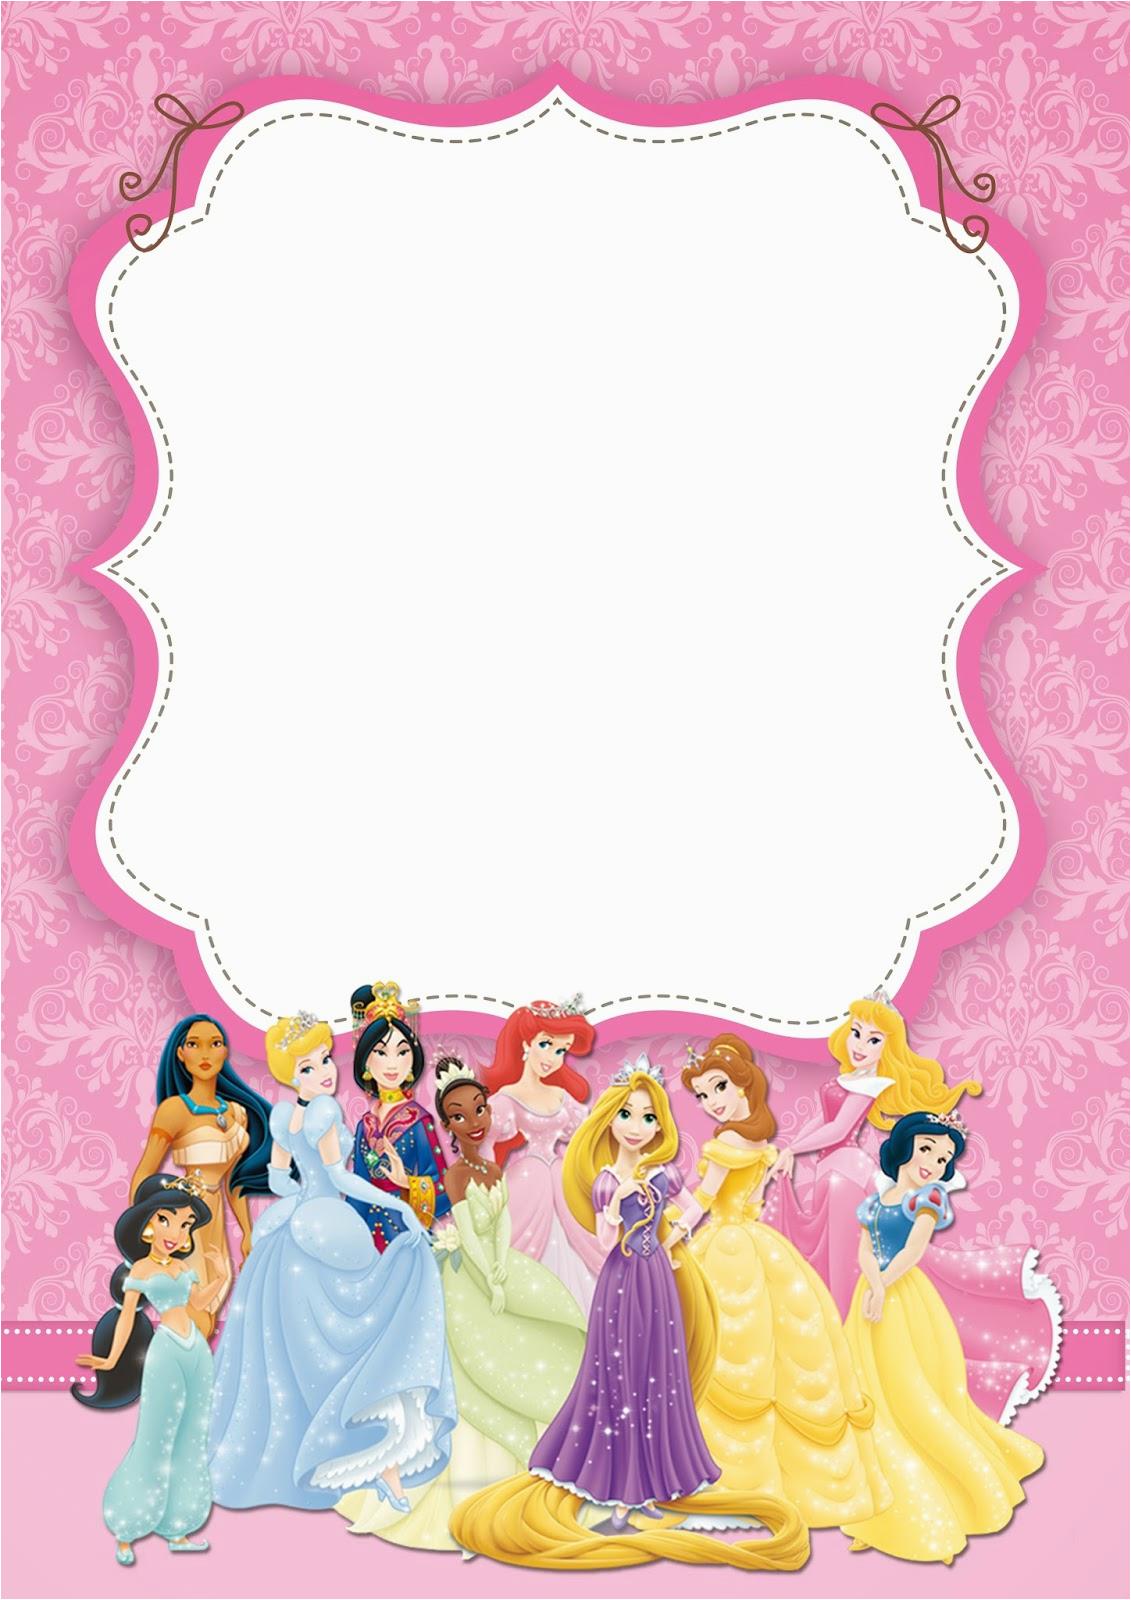 Disney Princess Birthday Party Invitations Free Printables Free